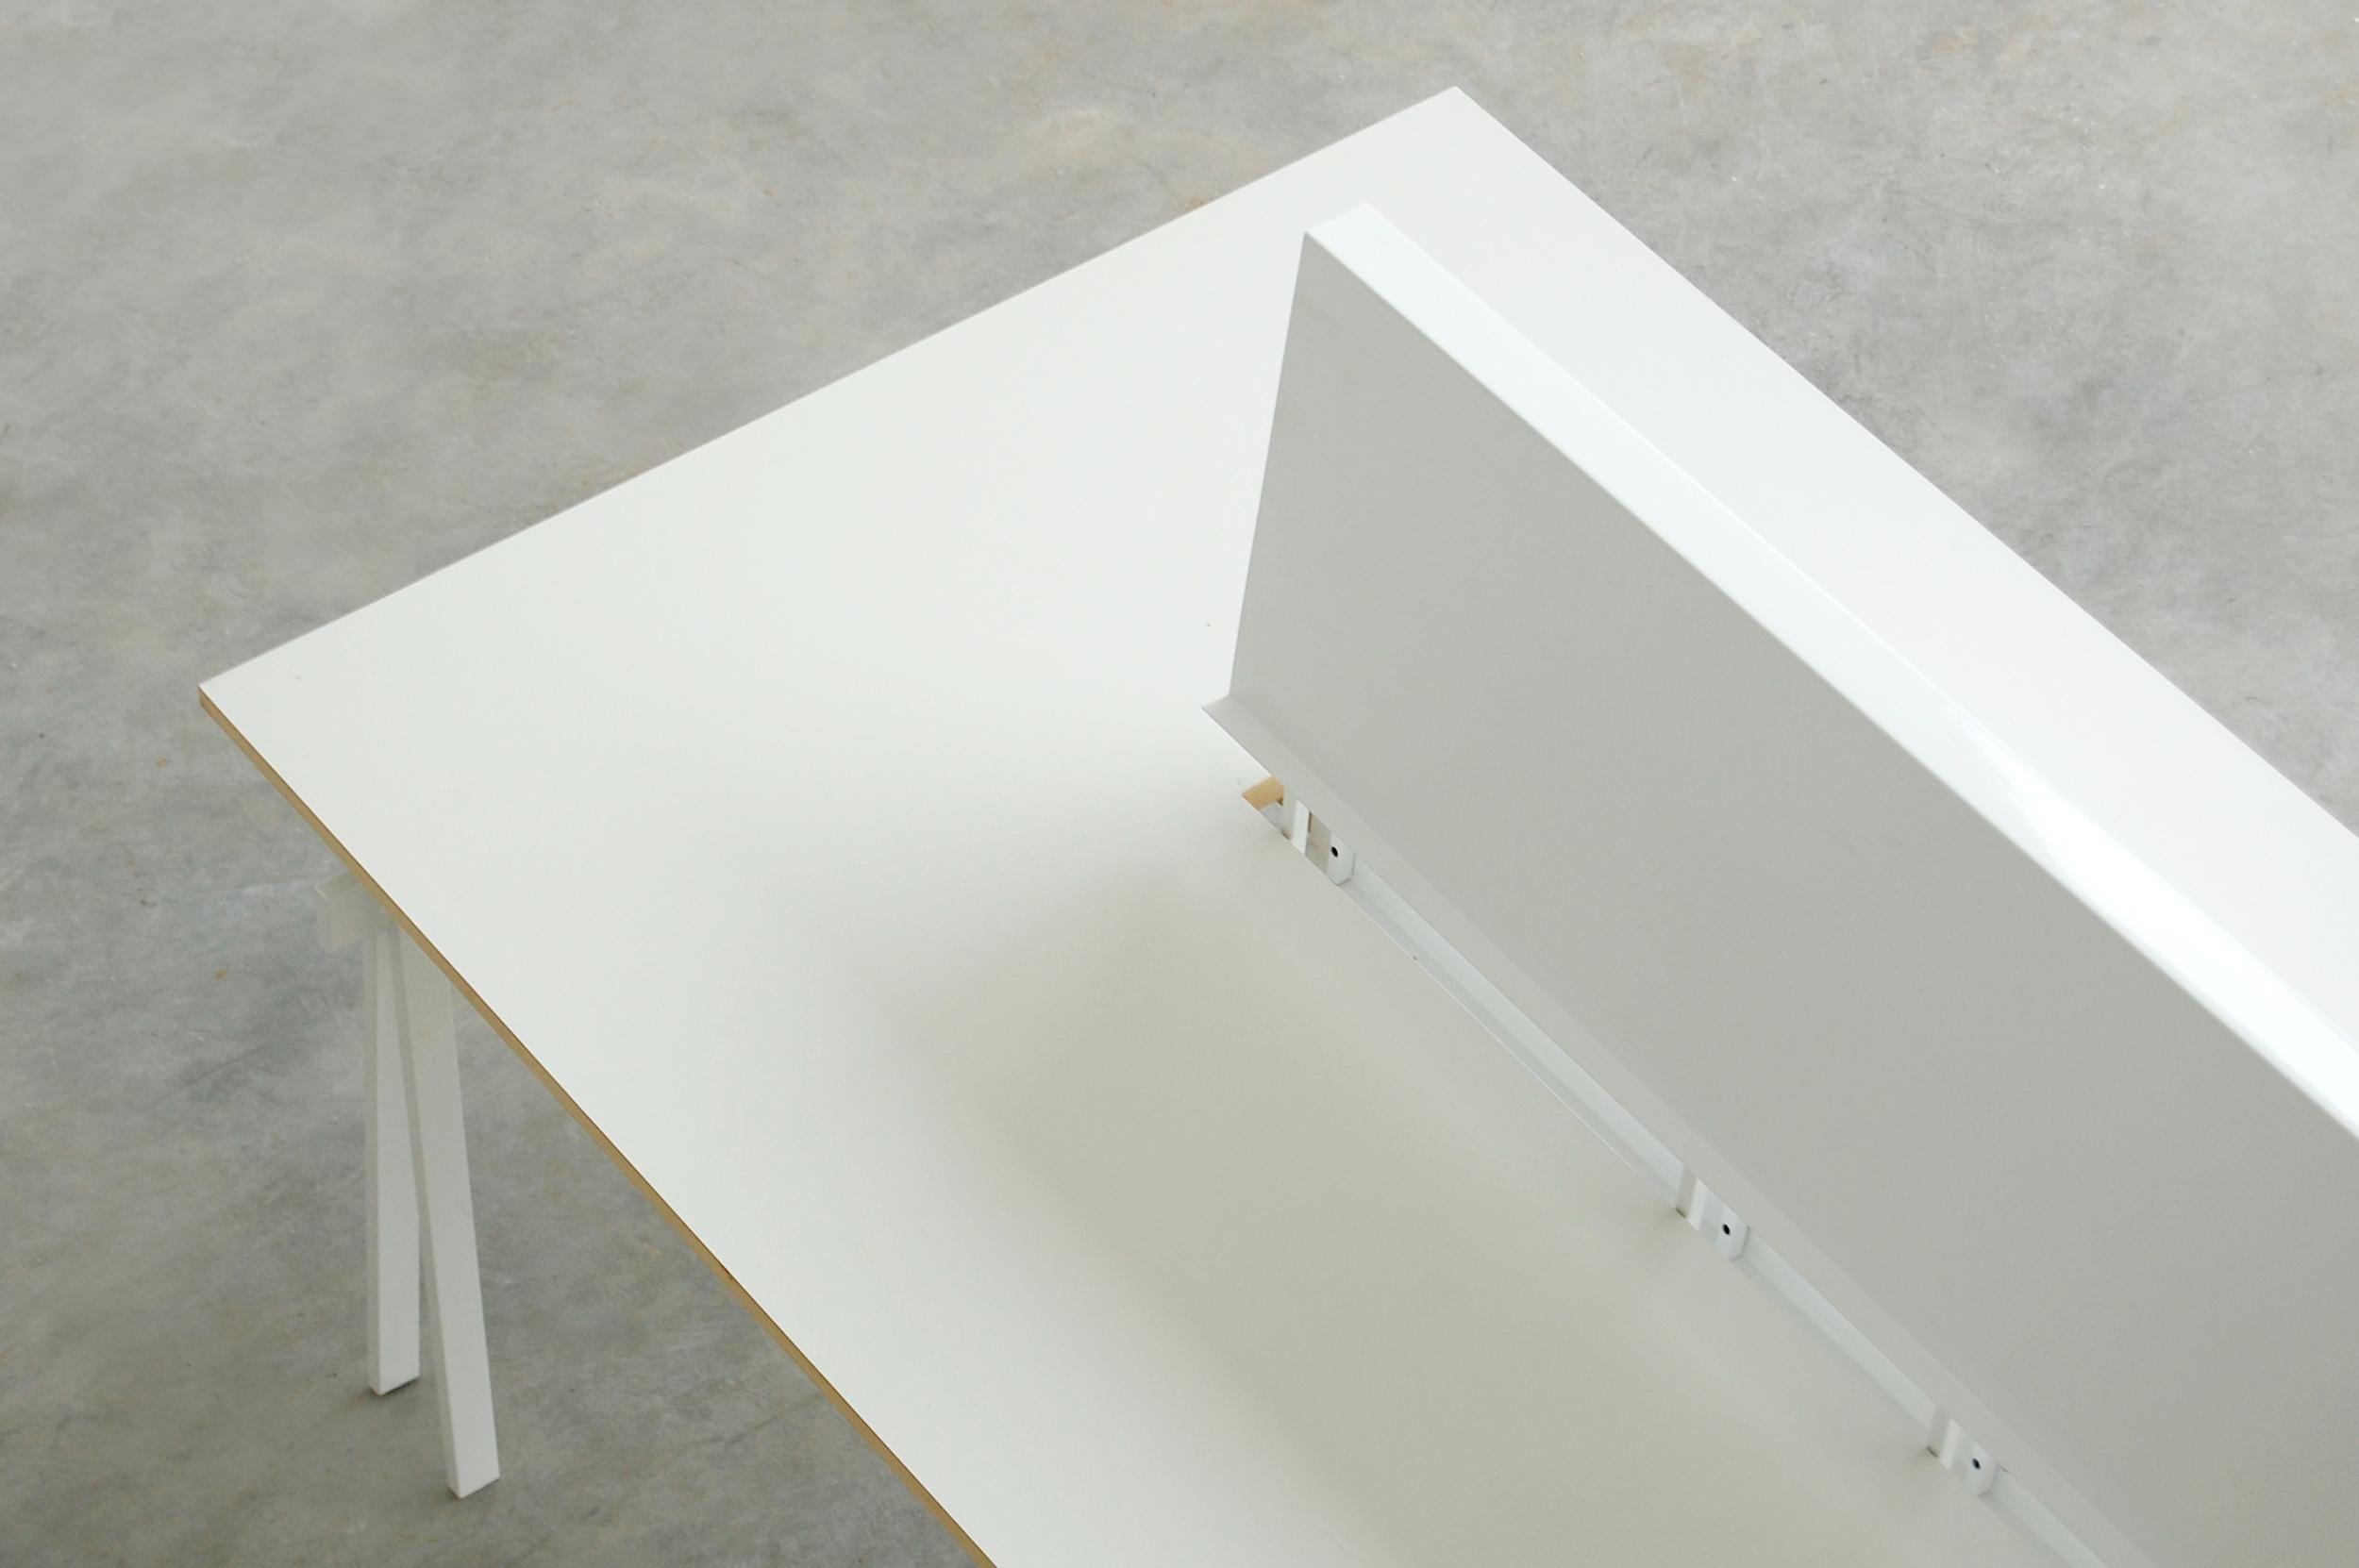 MC 2200   Estructura metálica con vigas de madera maciza de guatambú. Sistema de ensamble con bandeja intermedia.  Dimensiones: - 2200 x 850 x 1200  Material de tabla: formica/madera natural